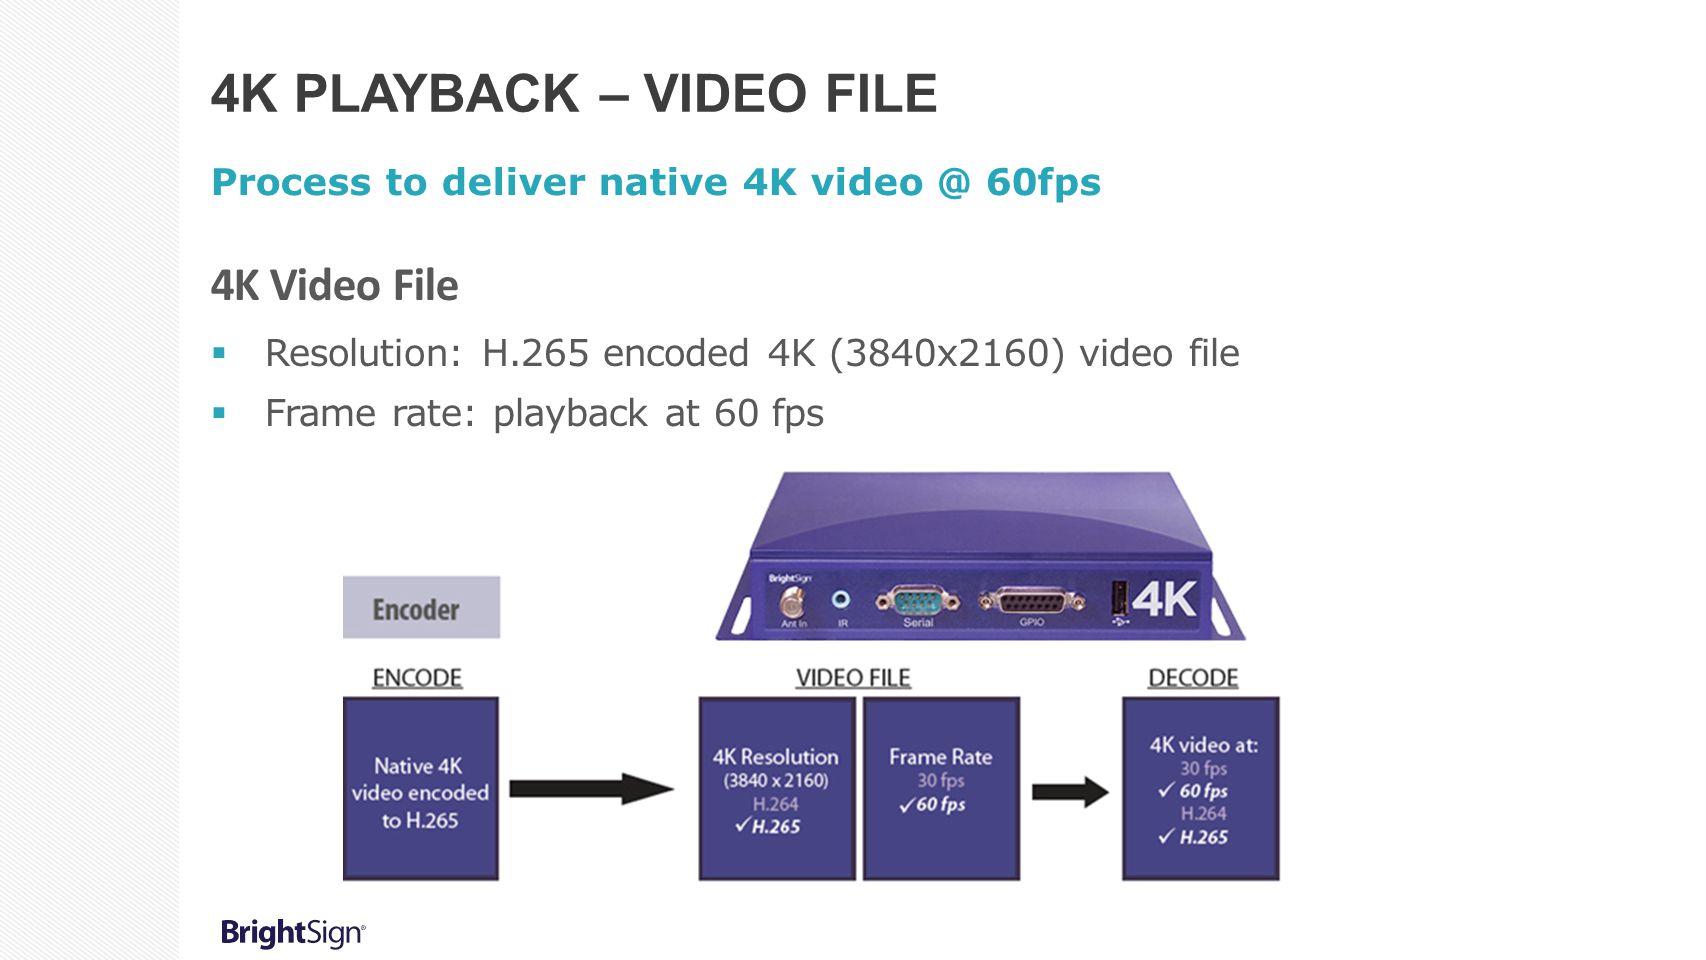 4K PLAYBACK – VIDEO FILE Process to deliver native 4K video @ 60fps 4K Video File  Resolution: H.265 encoded 4K (3840x2160) video file  Frame rate: playback at 60 fps